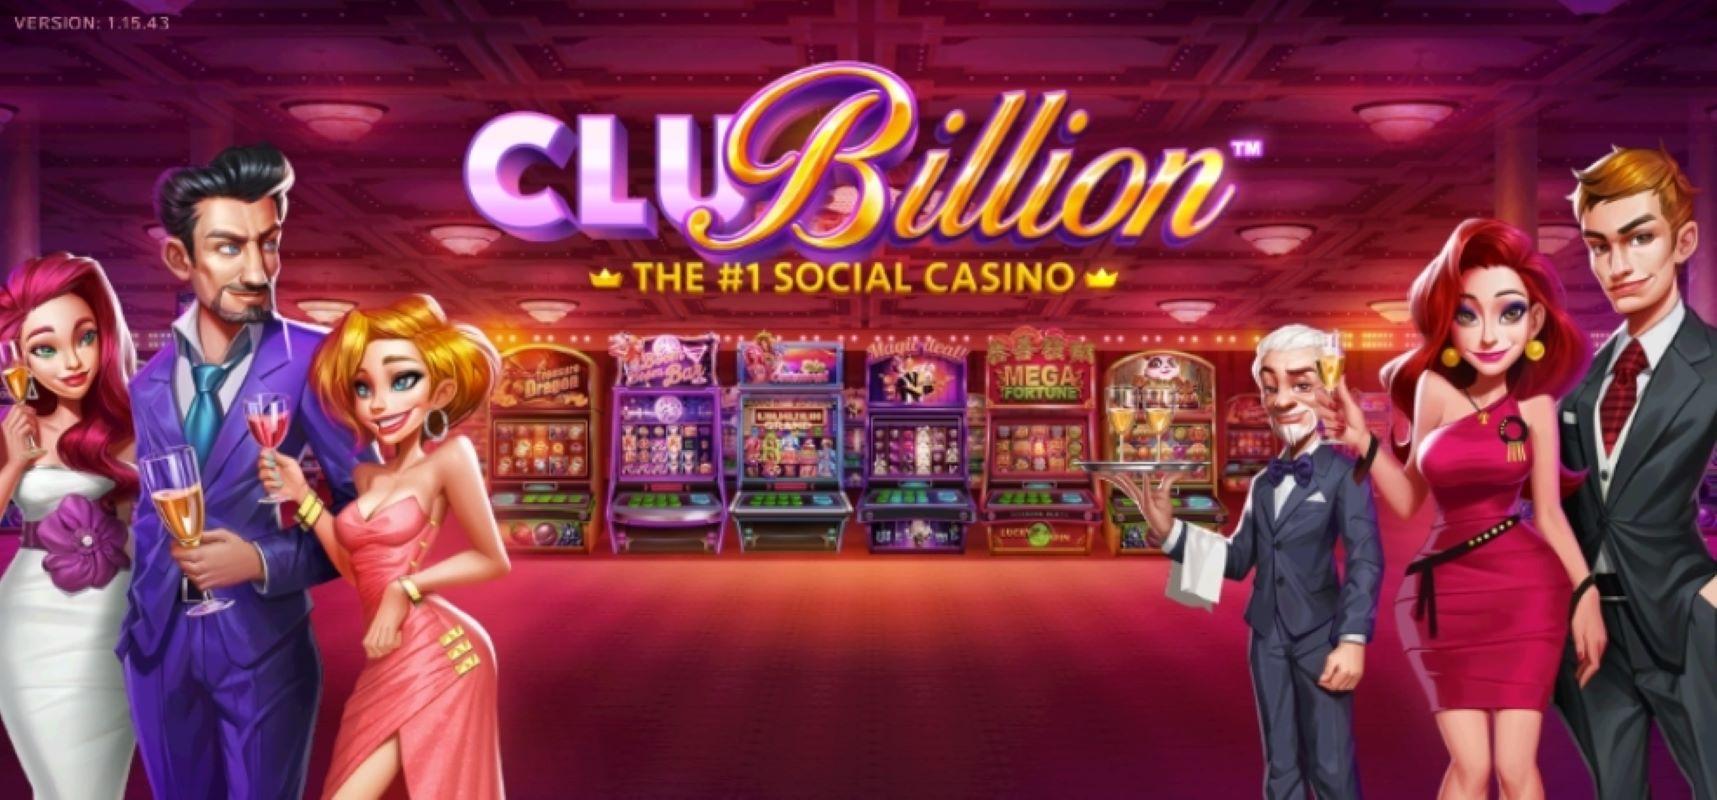 Clubillion Teaser, Männer, Frauen, Spielautomaten